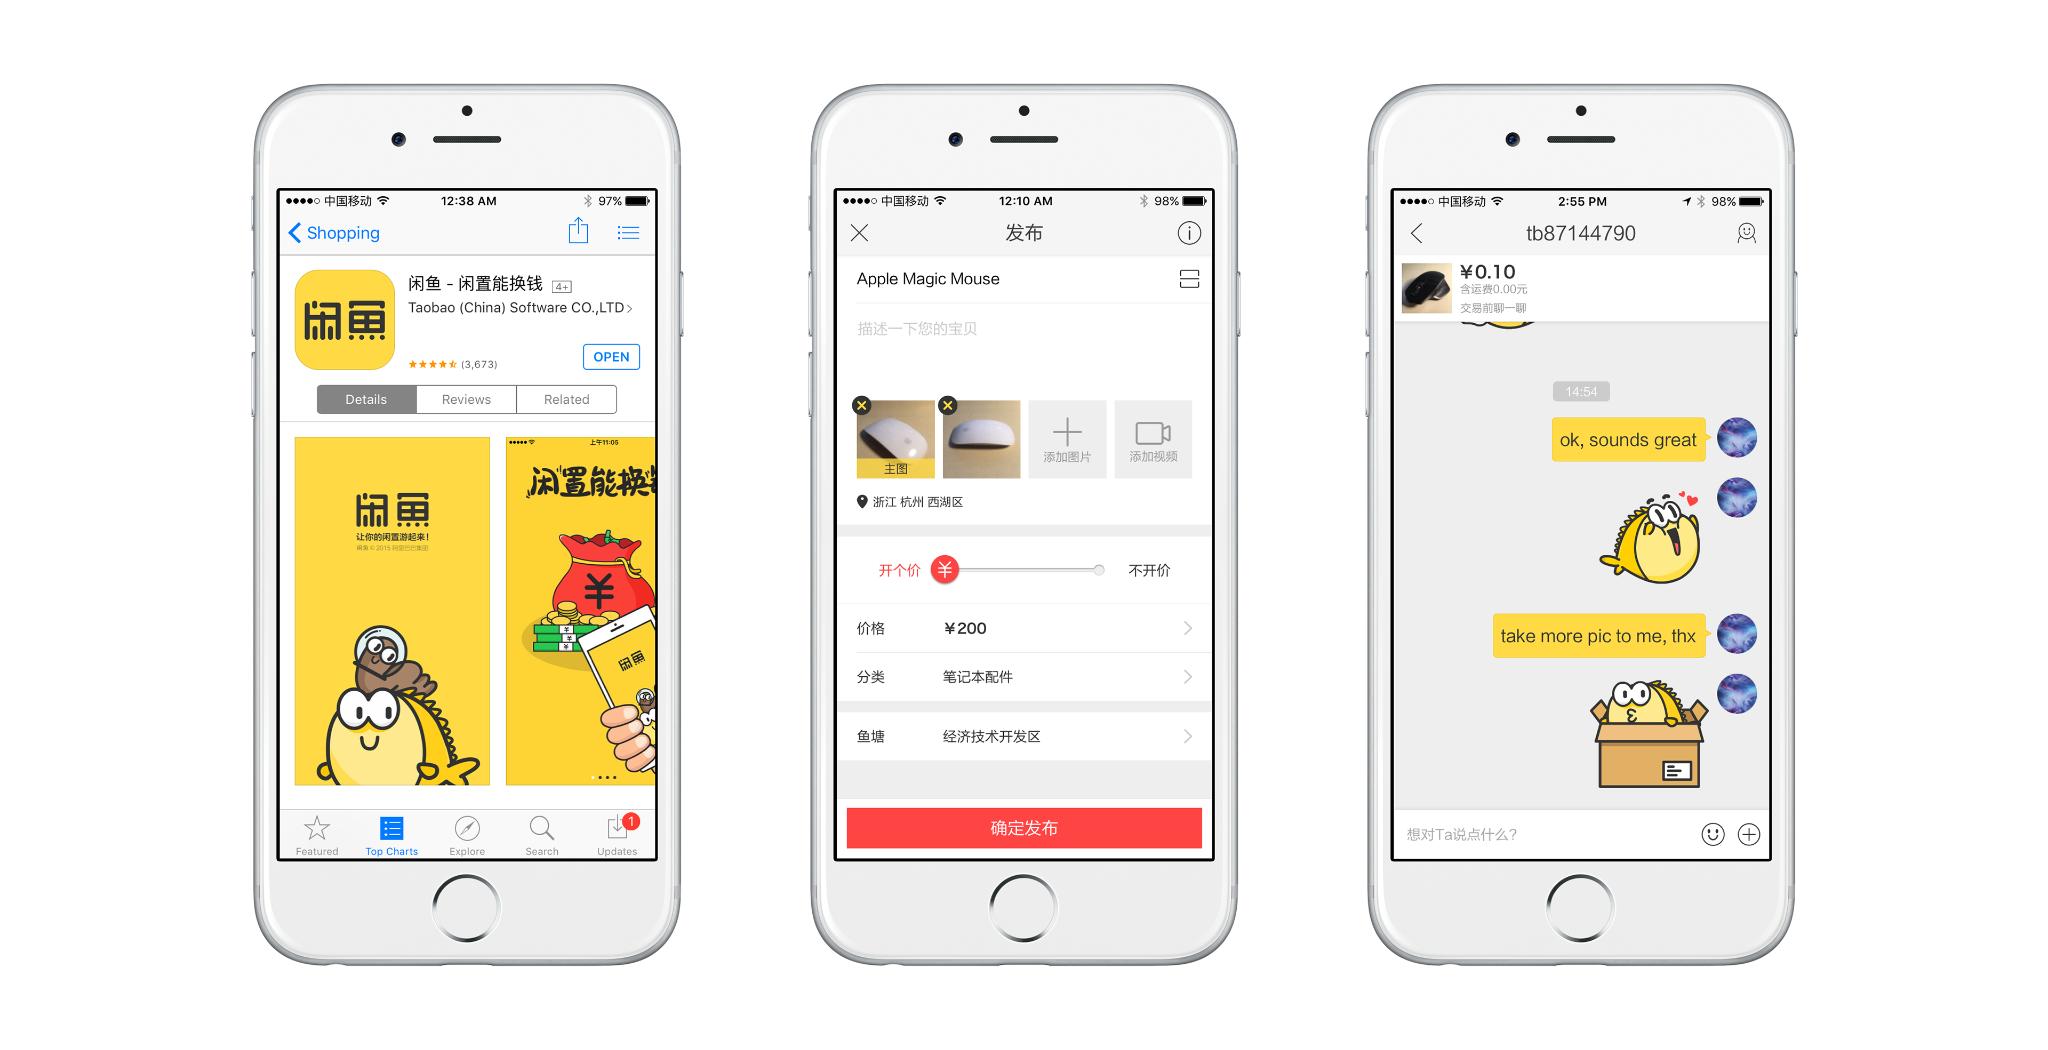 Xianyu app by Alibaba